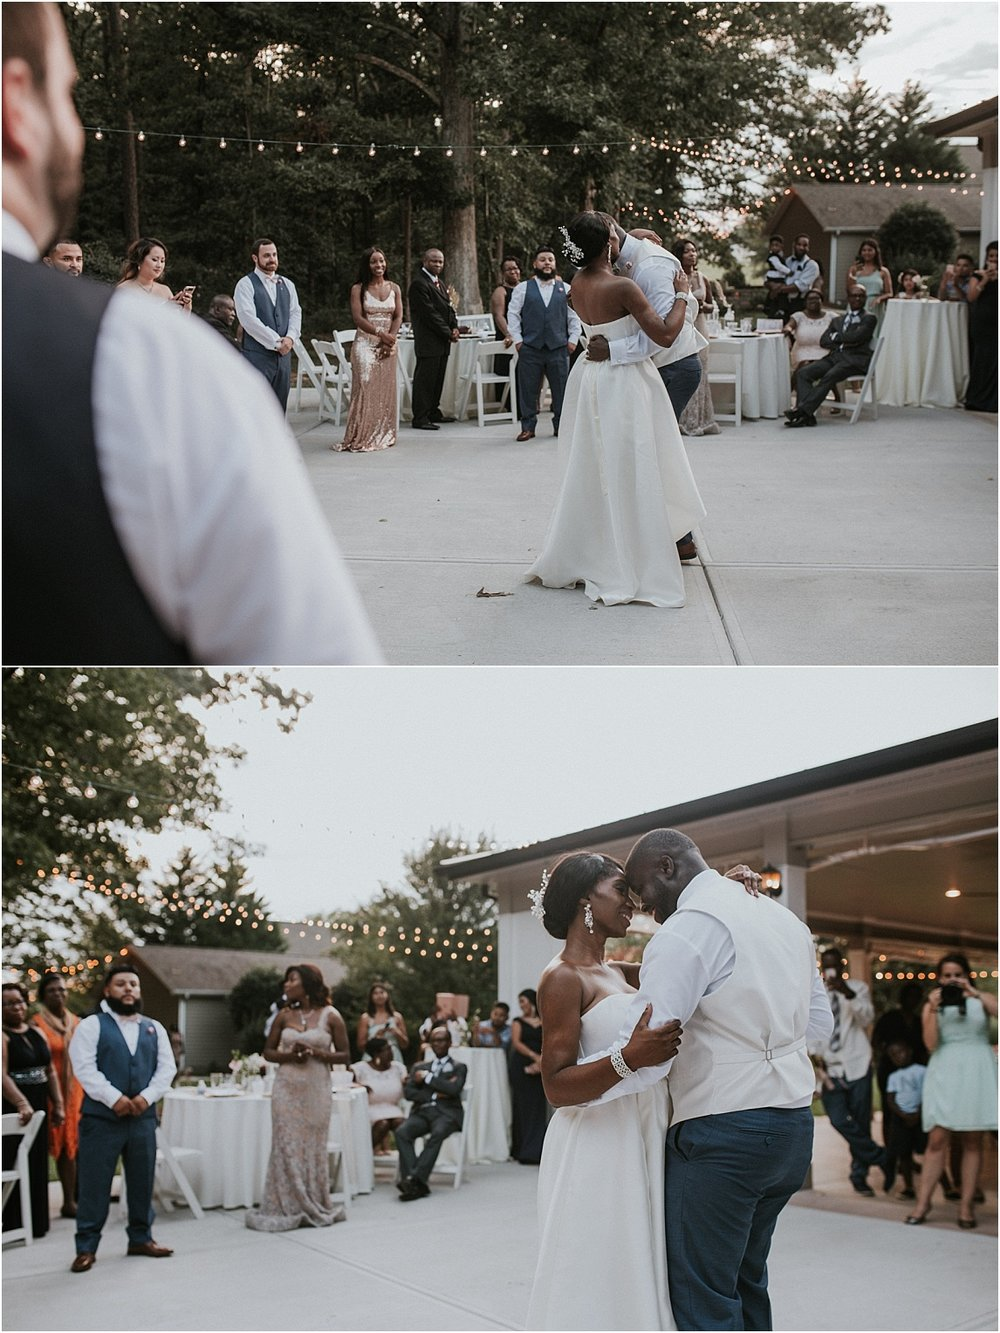 Posh-Moments-Photography-NC- Wedding-Photographer-Rolling-Hills-Farms-Wedding-Monroe-NC-Charlotte-NC_0162.jpg